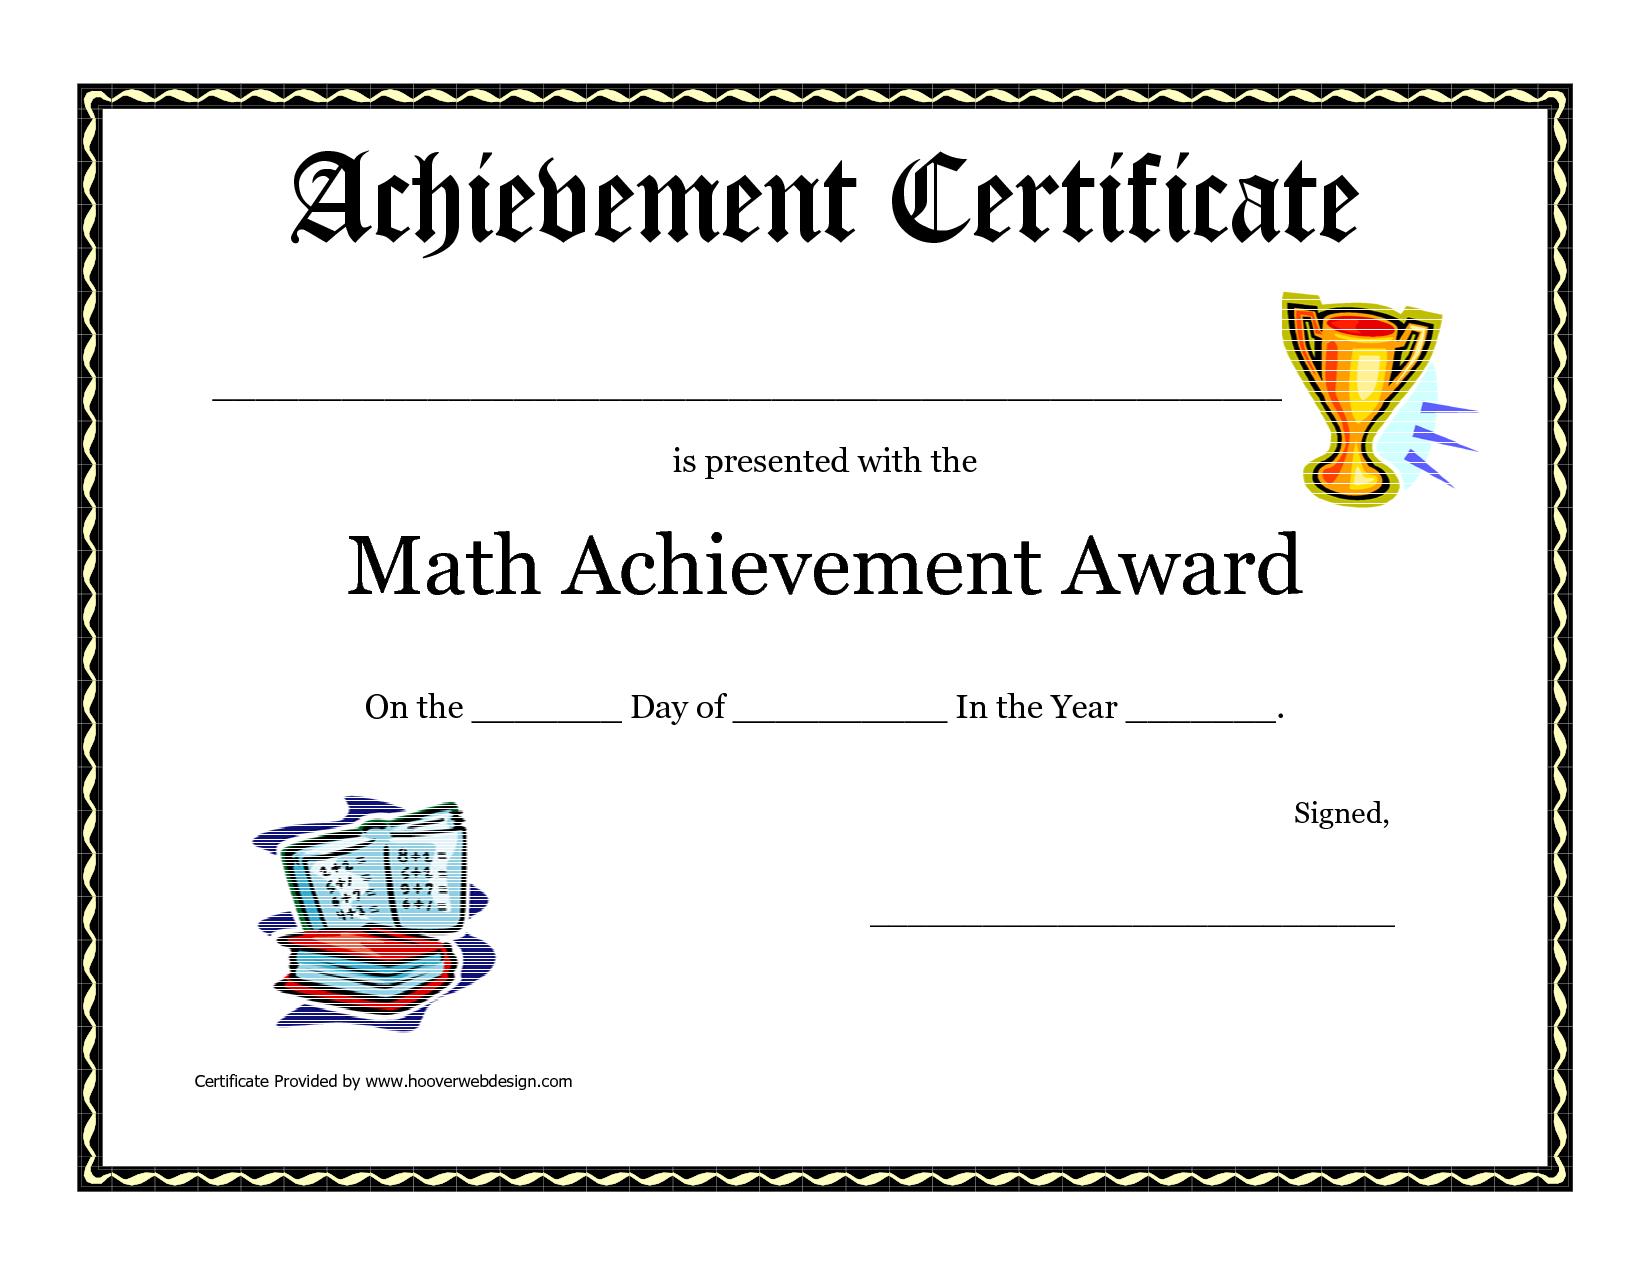 Math Achievement Award Printable Certificate Pdf | Math Activites - Free Printable School Achievement Certificates